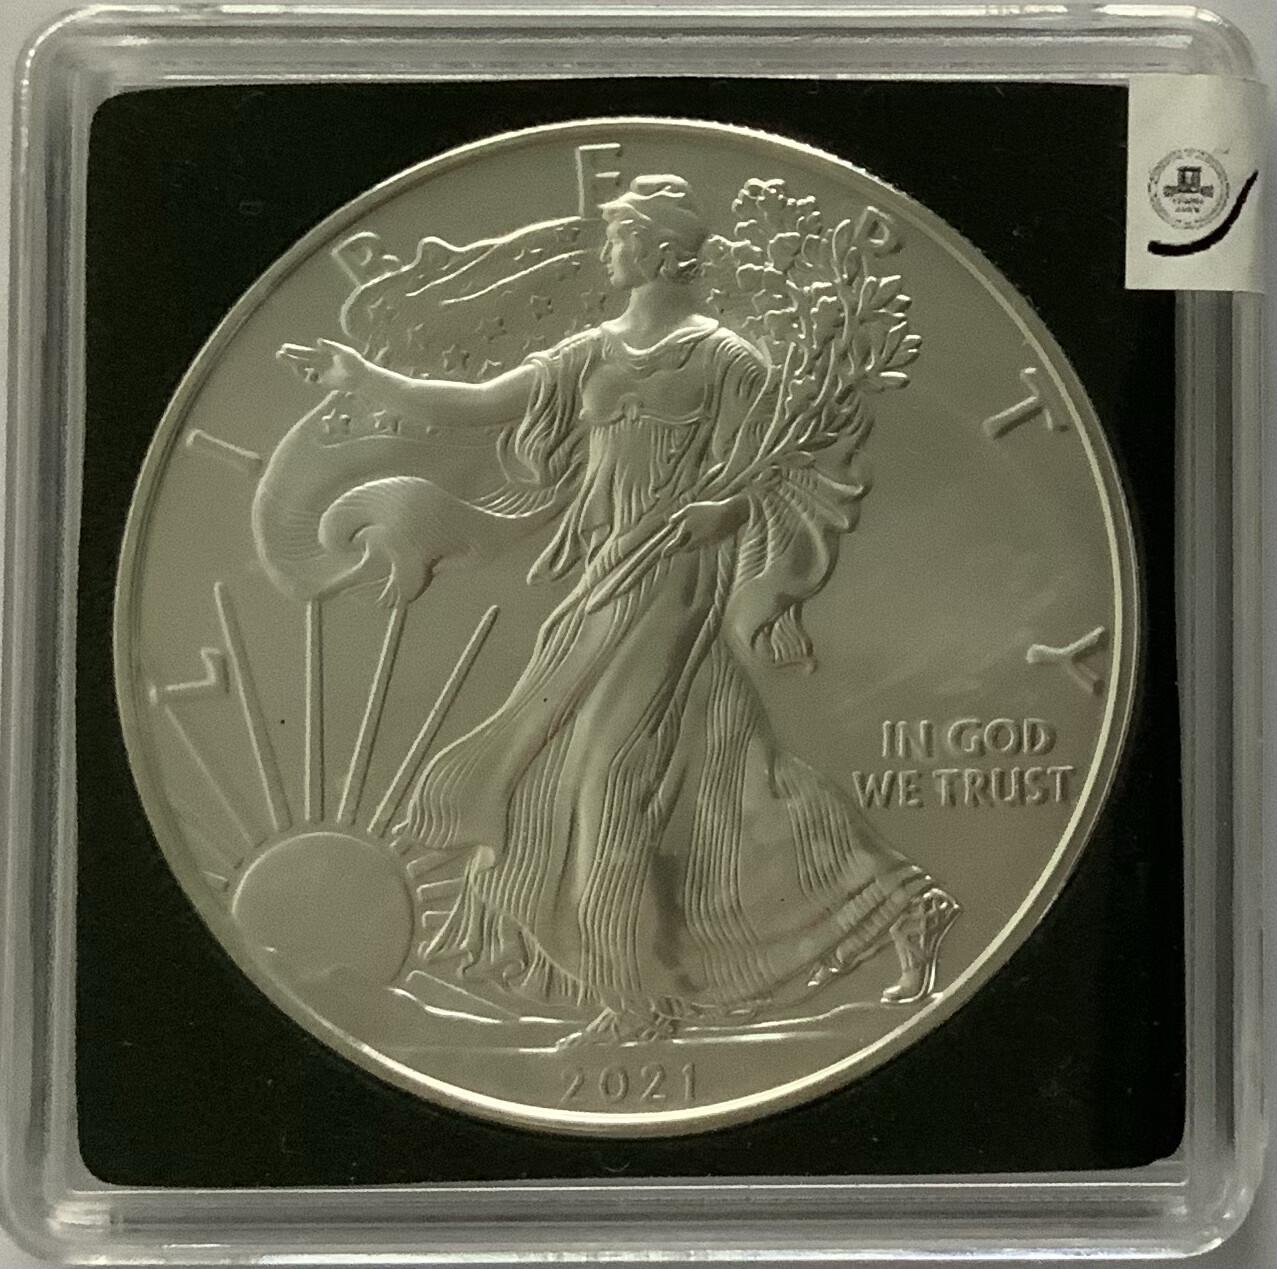 Certified 0206 Liberty 2021